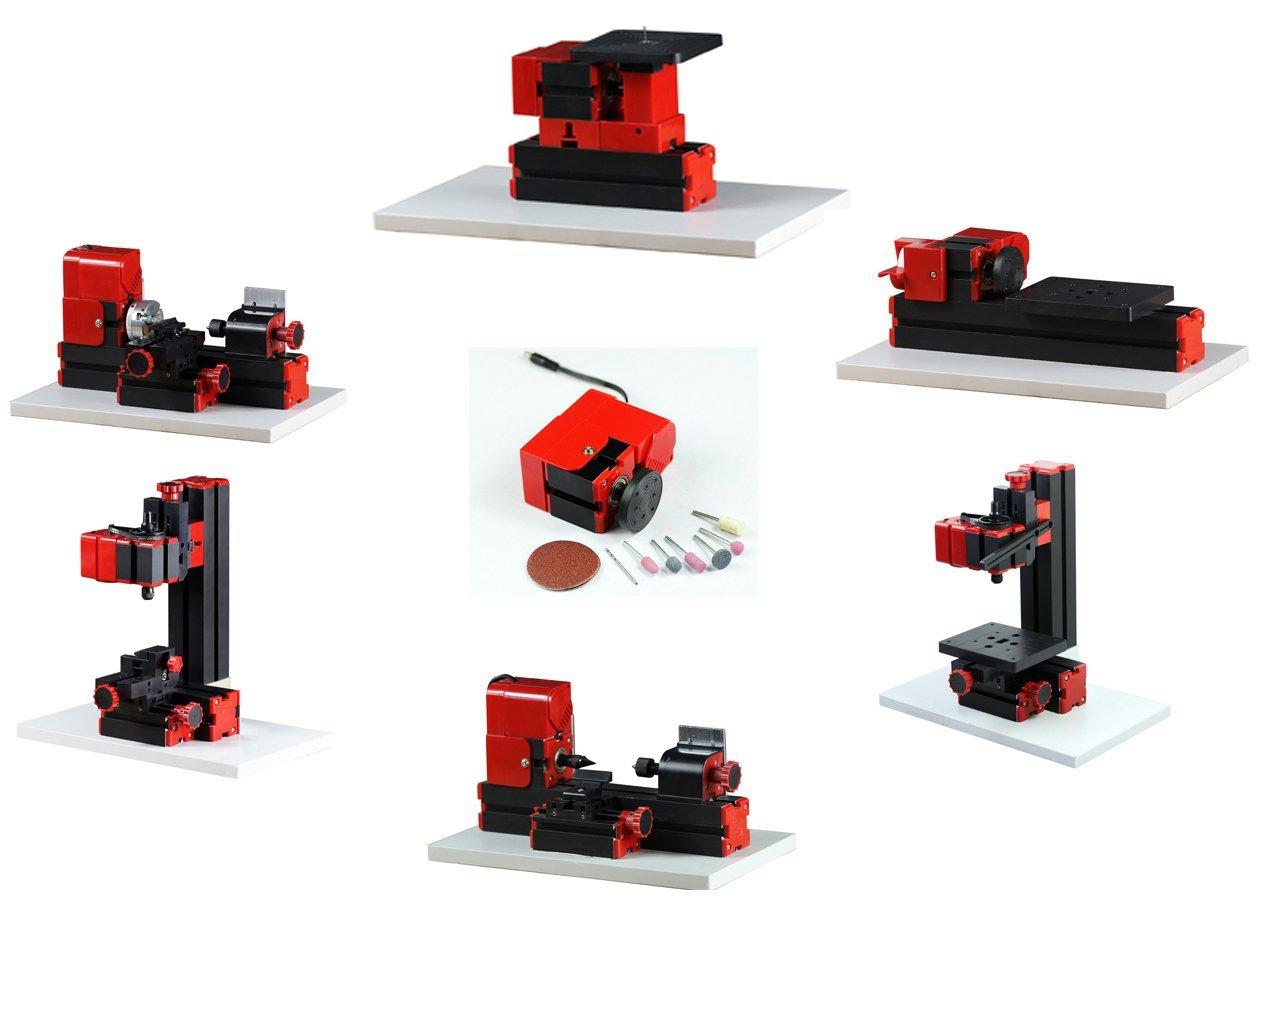 ZhouYu 6 in 1 24W Basic Mini Multi-function Combination Machine Tools, Mini Lathe ,Milling ,Drilling ,Wood Turning ,Jag Saw and Sanding Machine,Mini Combined Machine Tool, DIY Tool